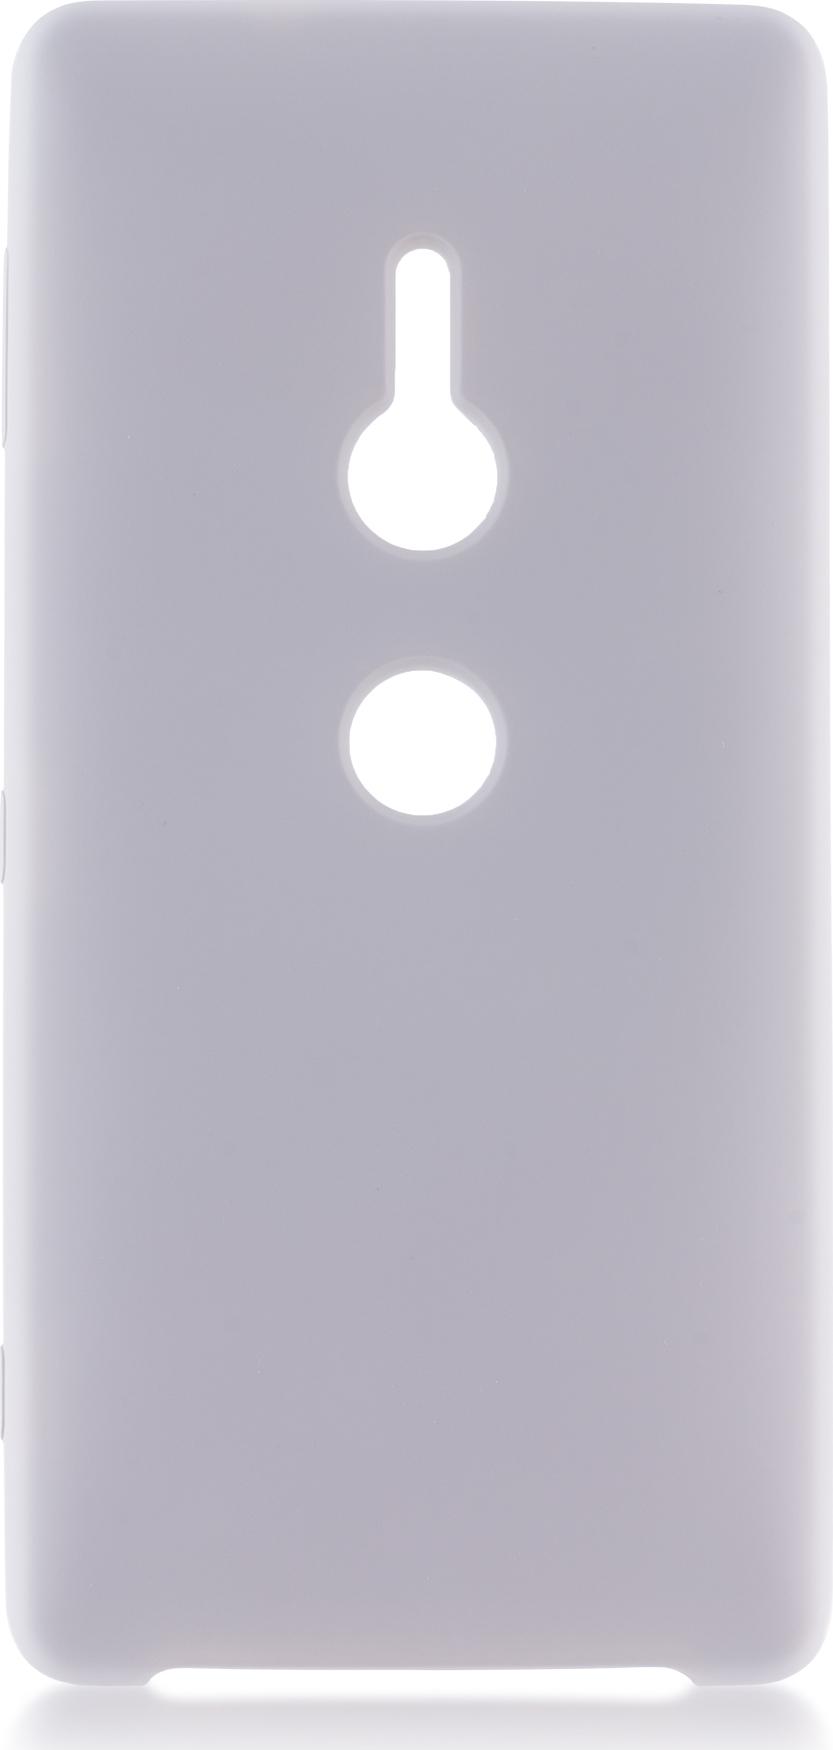 Чехол Brosco Softrubber для Sony Xperia XZ2, серый wierss розовый для sony xz2